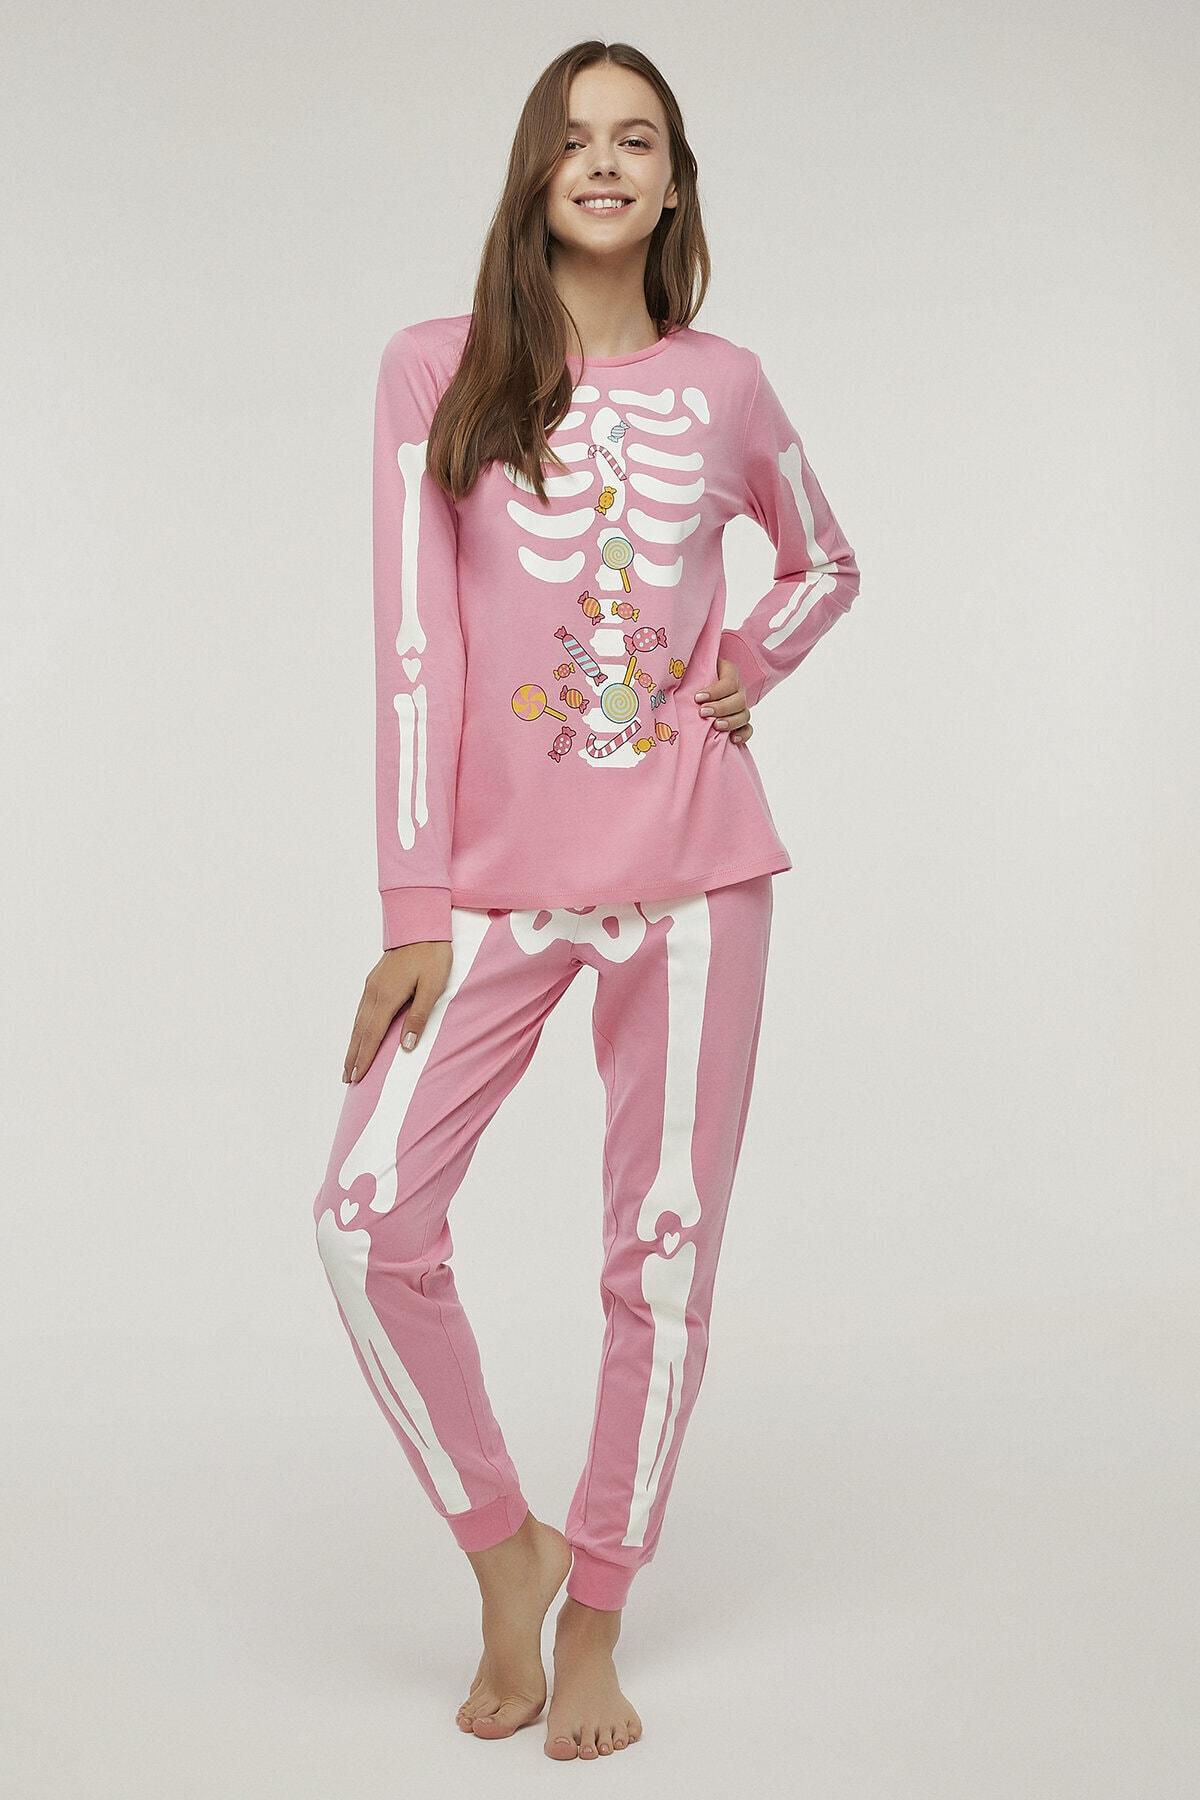 Penti Pembe Skeleton Pijama Takımı 1